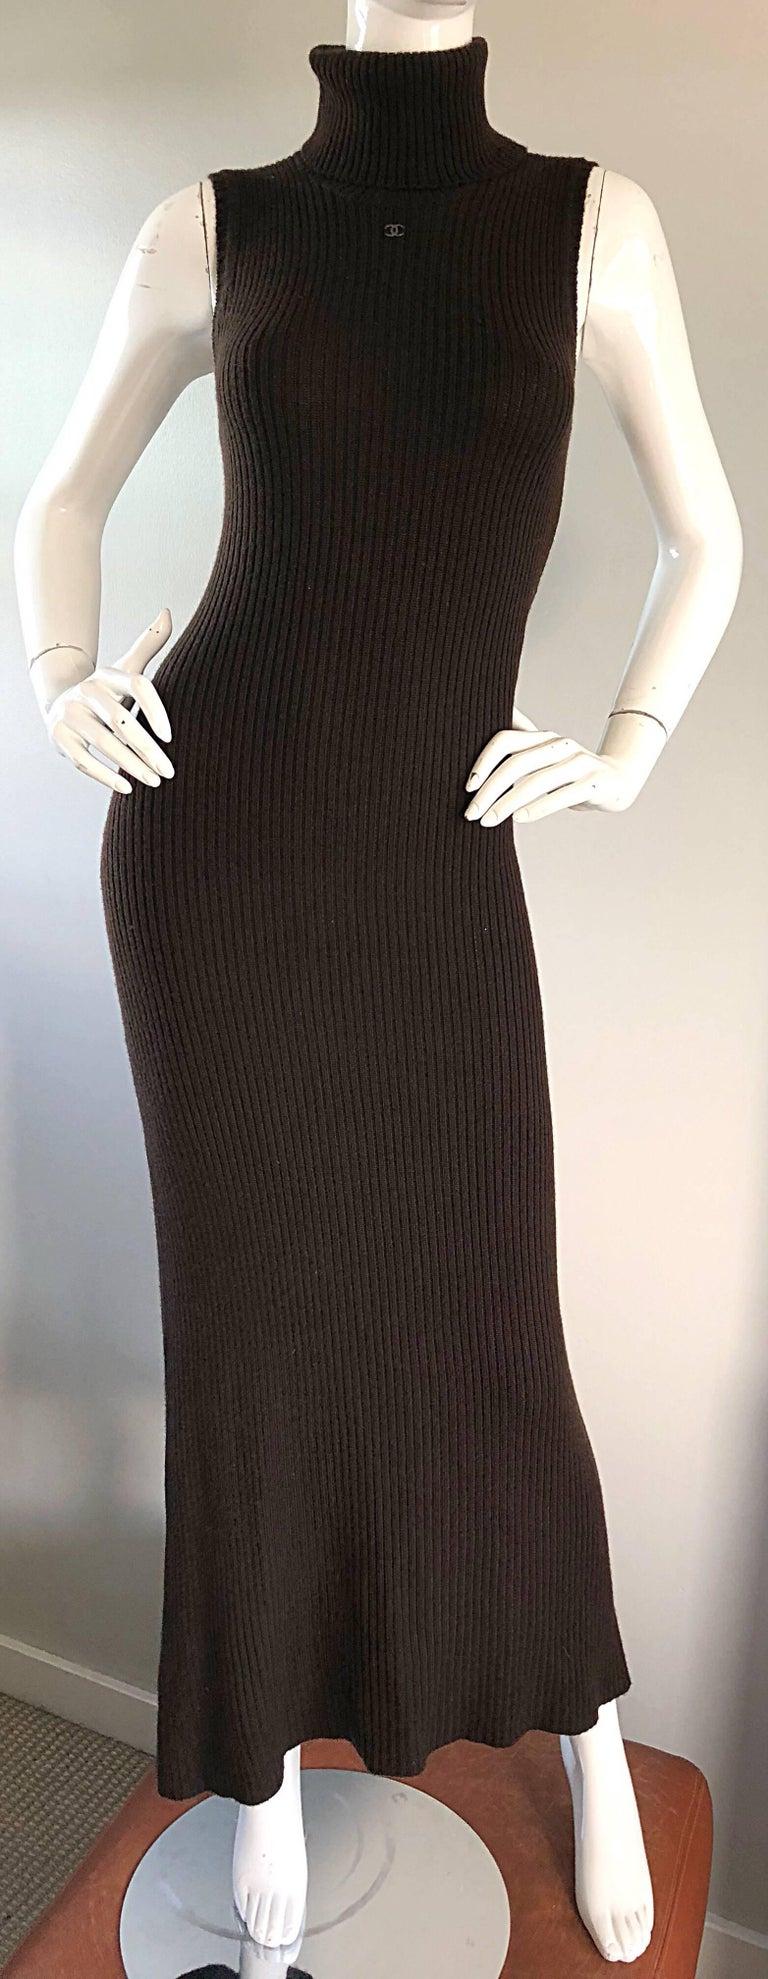 Chanel Vintage 99A Espresso Brown Cashmere Turtleneck 1990s 90s Sweater Dress 4